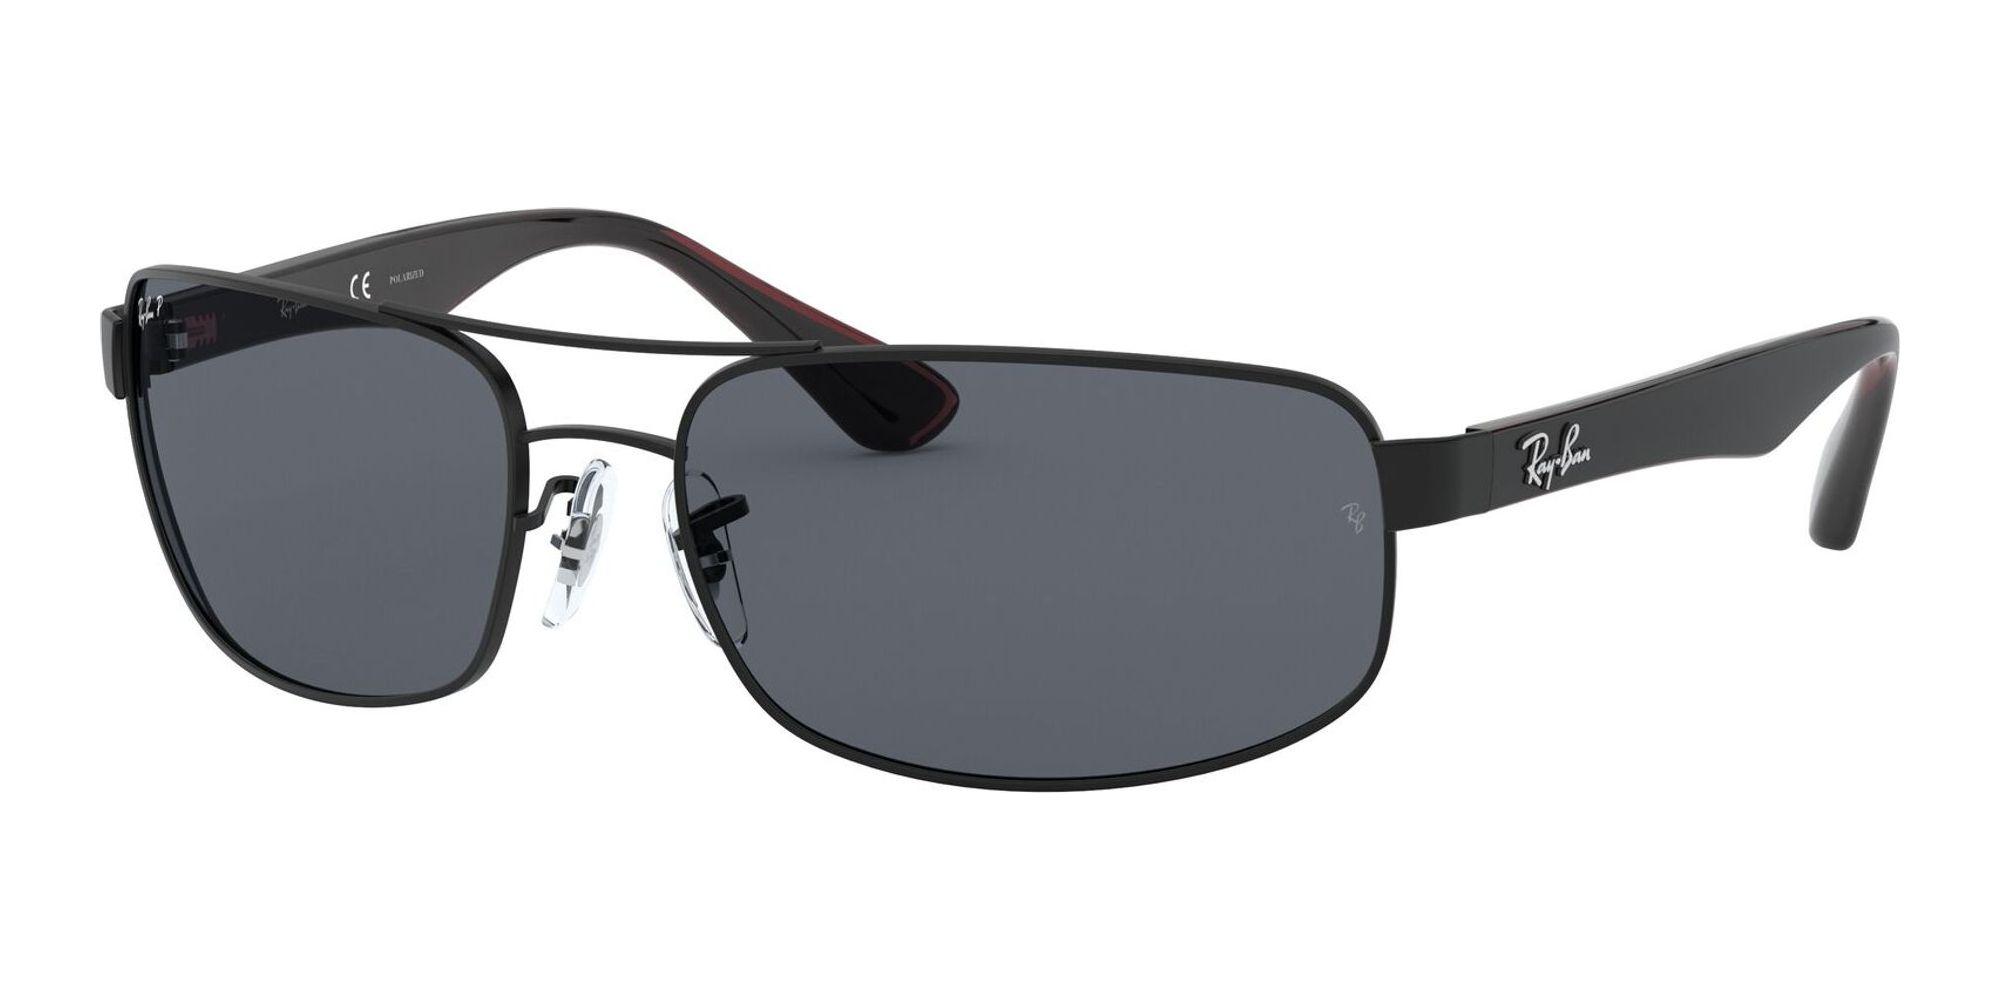 Ray-Ban zonnebrillen RB 3445